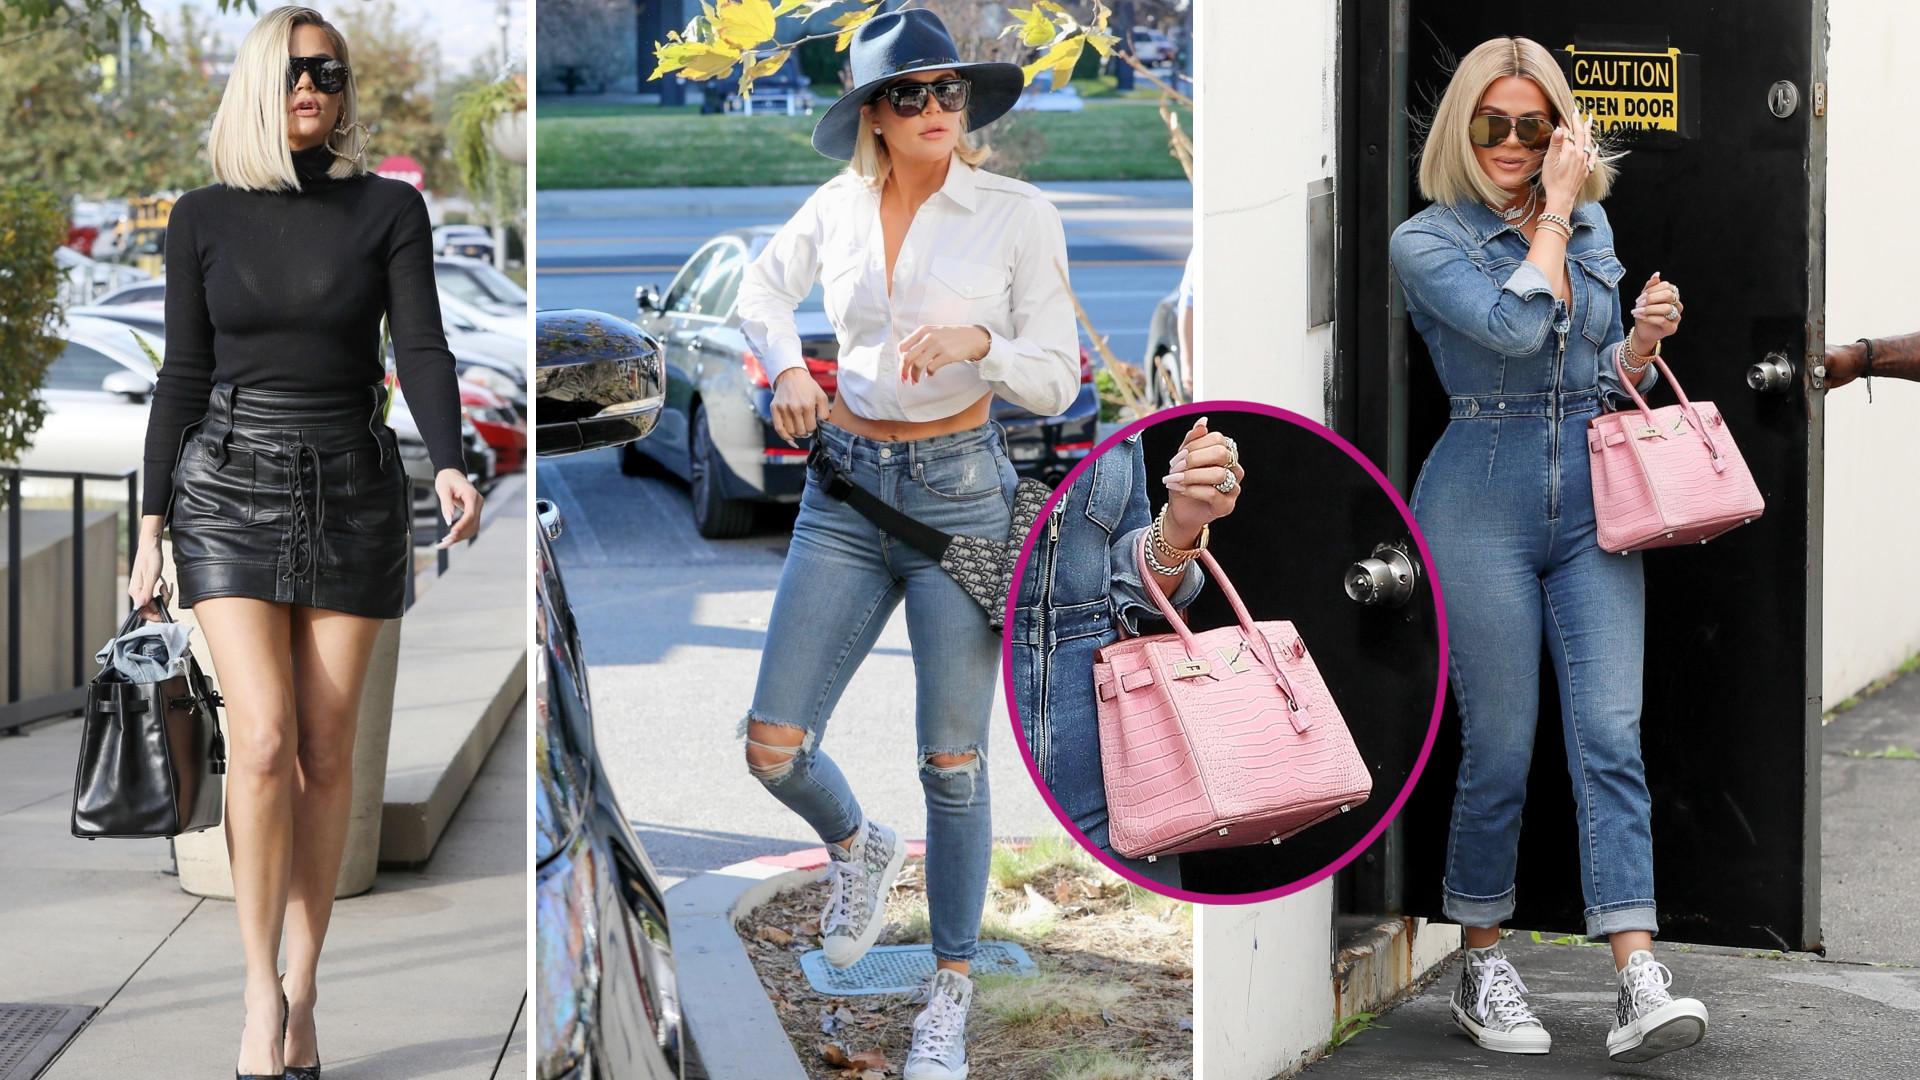 Khloe Kardashian – seksowny styl celebrytki (ZDJĘCIA)